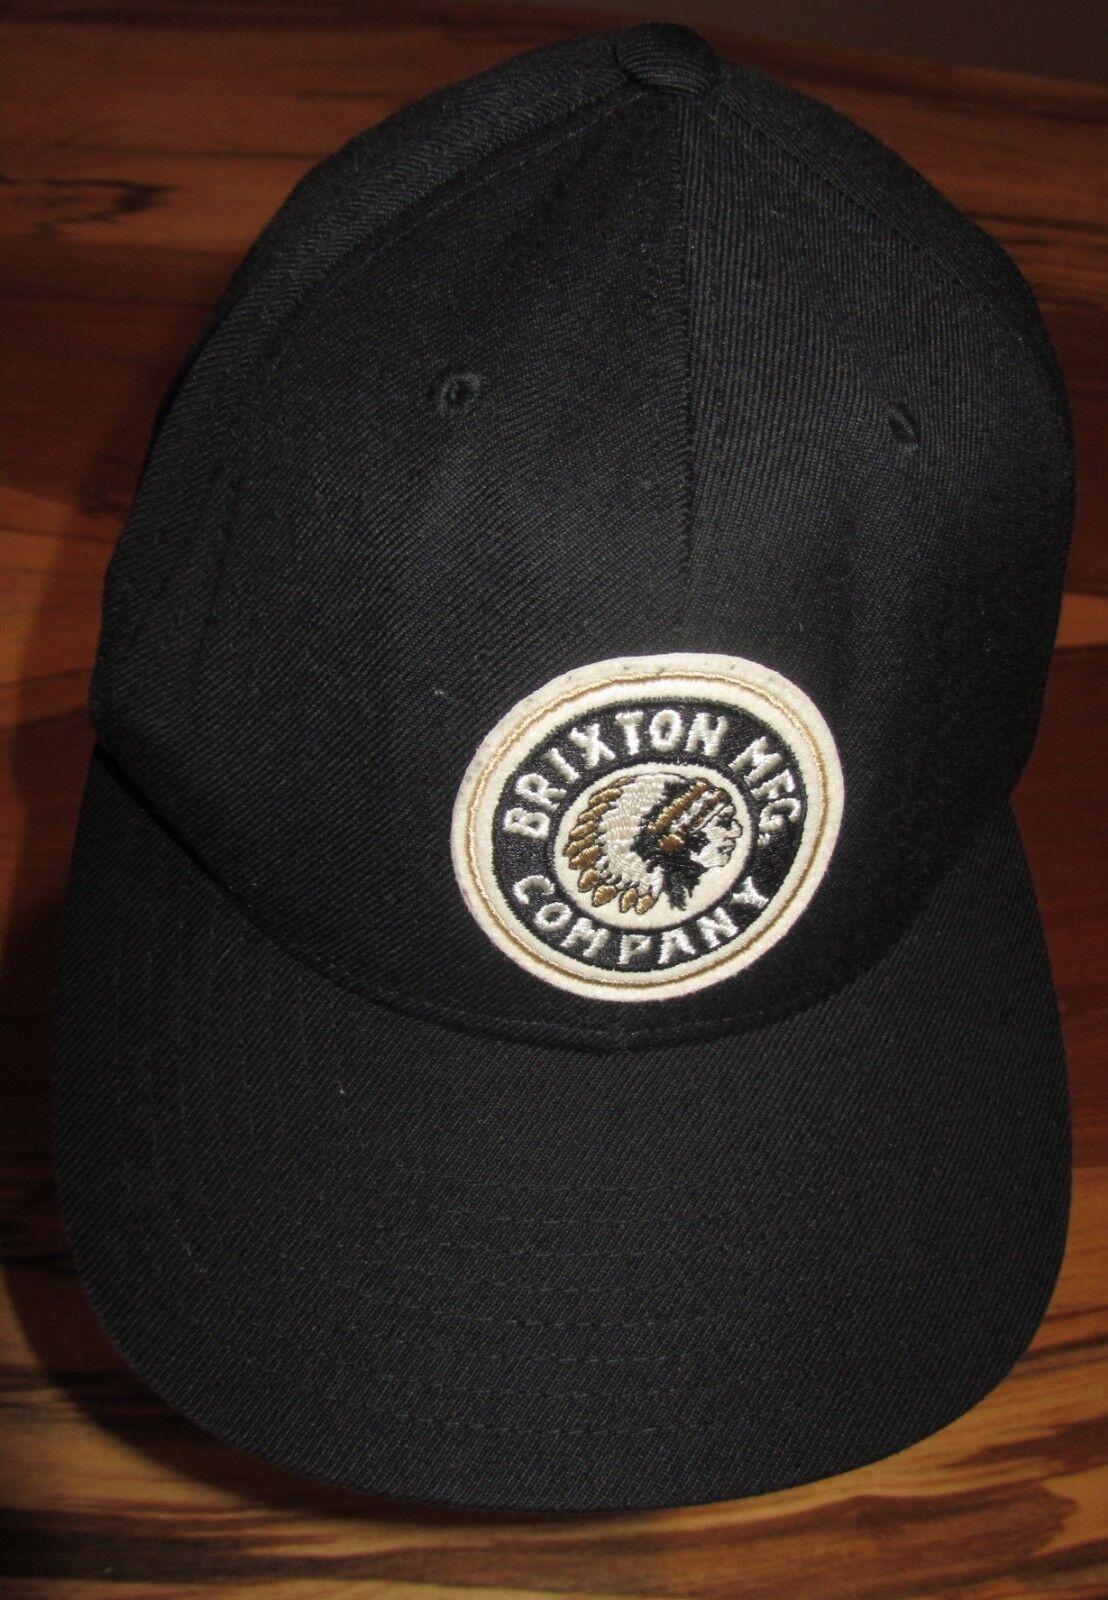 ... italy brixton mfg company mens baseball cap hat euc indian chief black  snapback euc hat 01a999 ... 372f45fc3e91